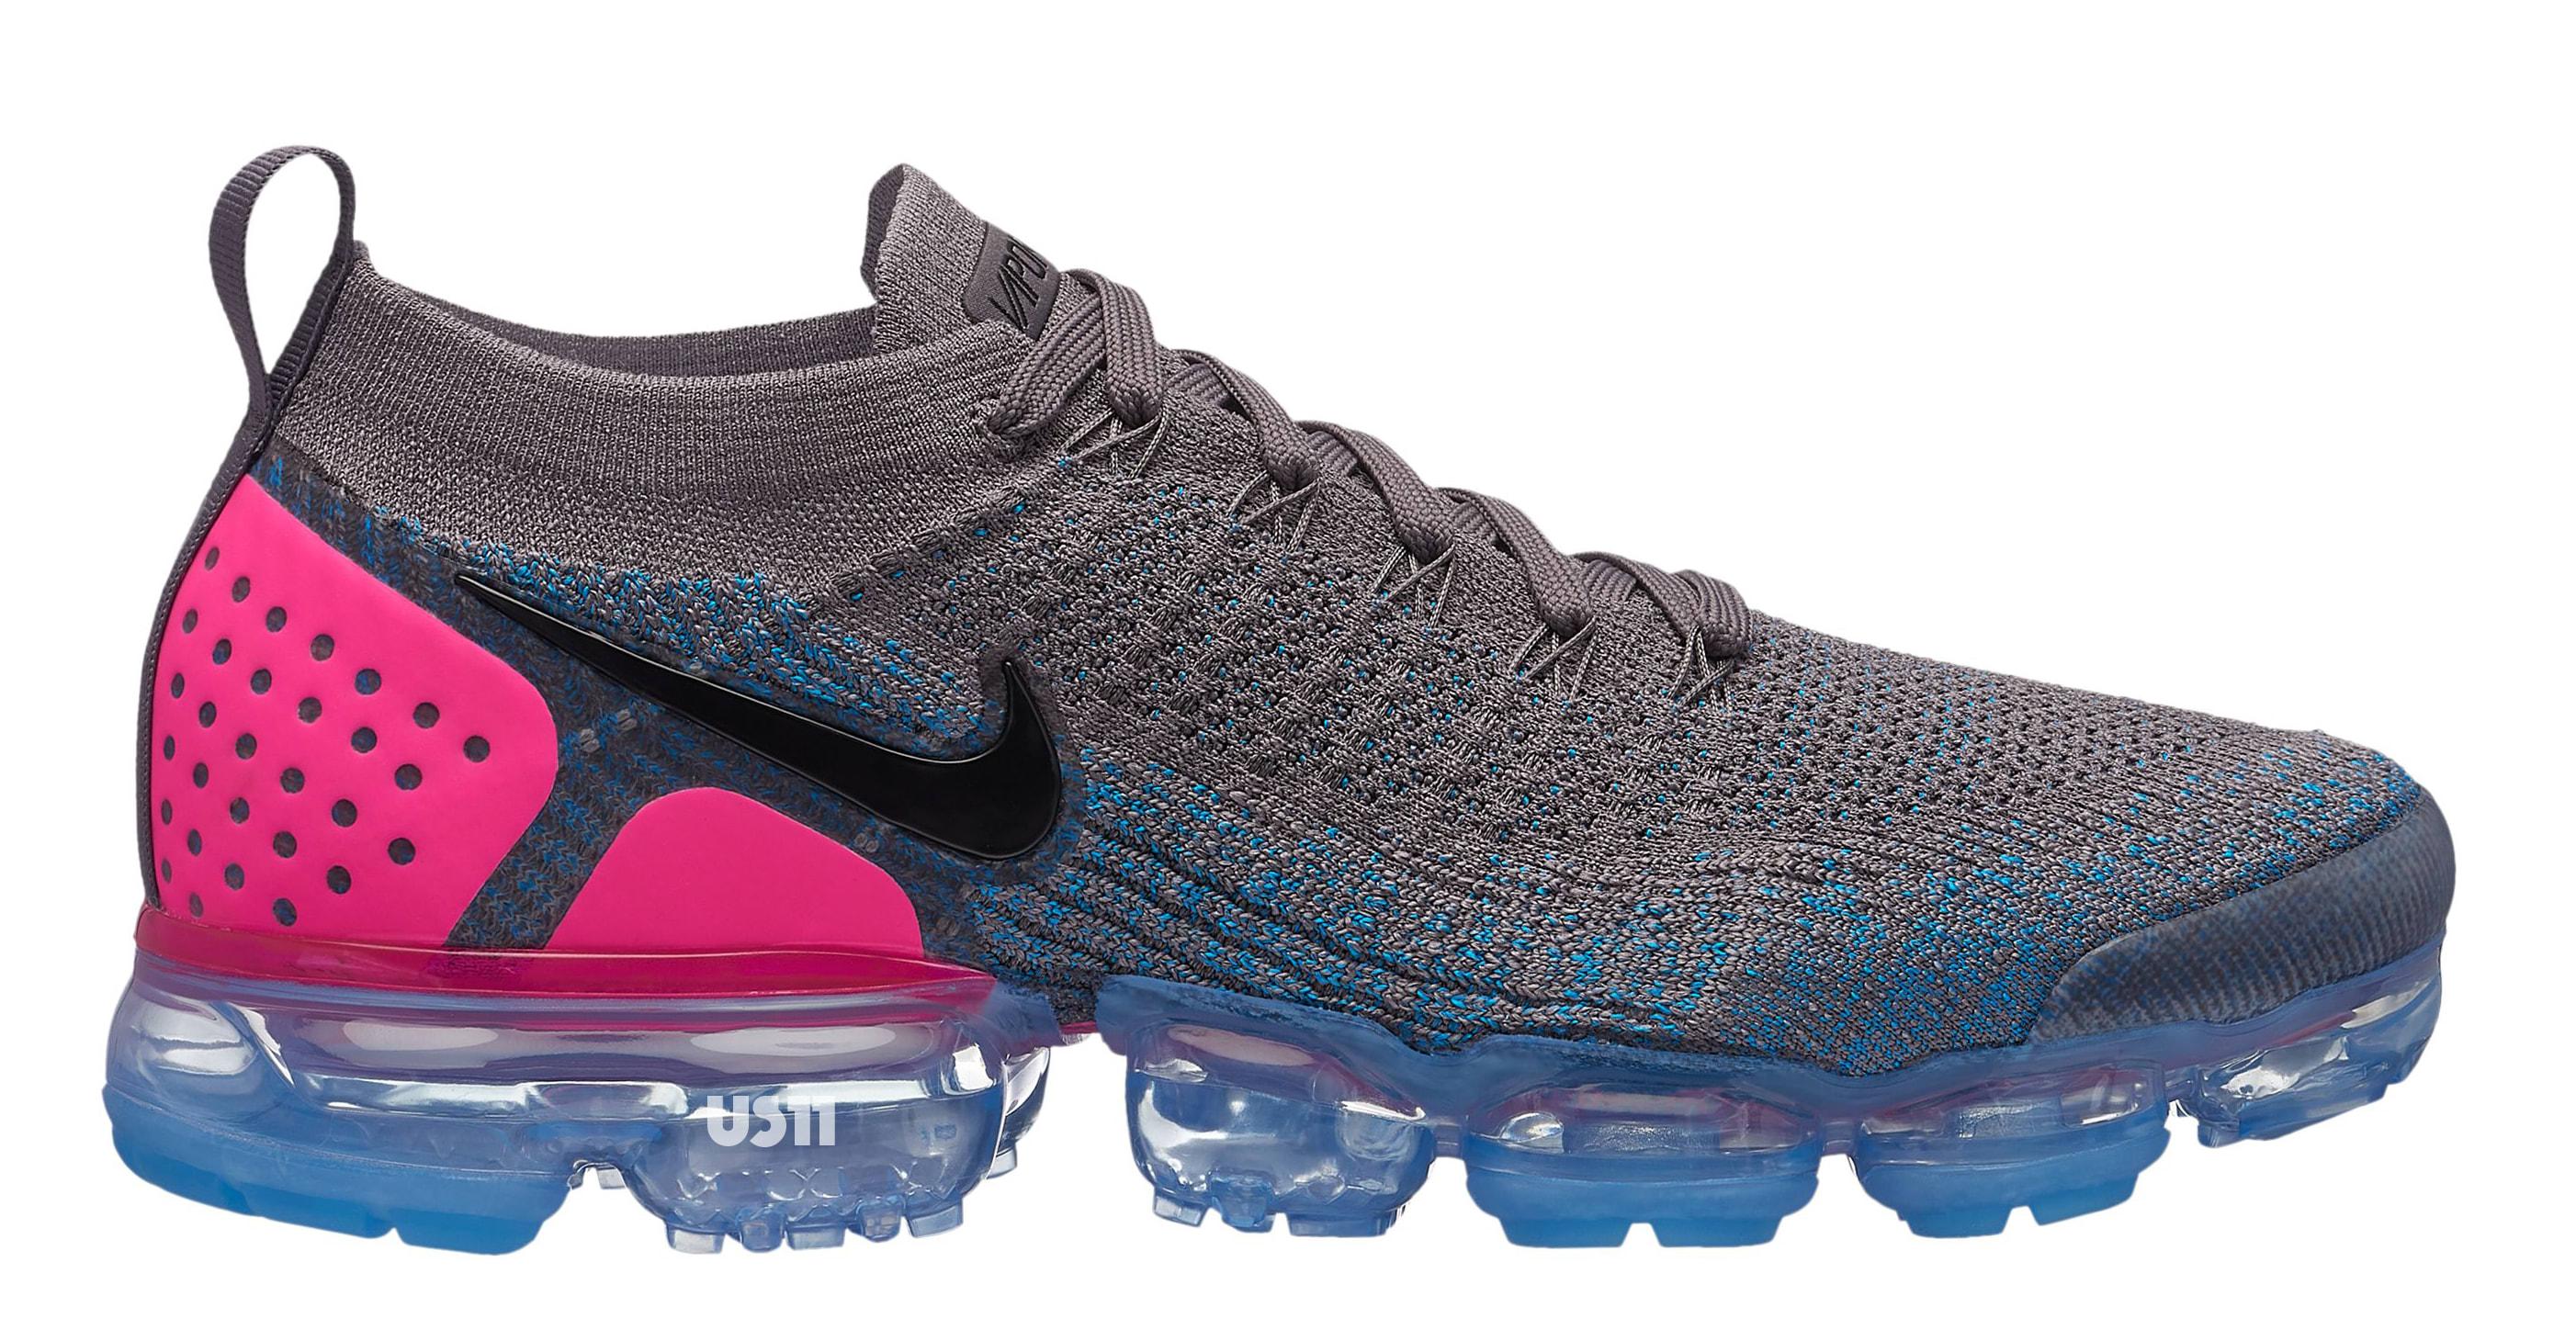 Nike Air VaporMax 2.0 Grey/Pink/Blue